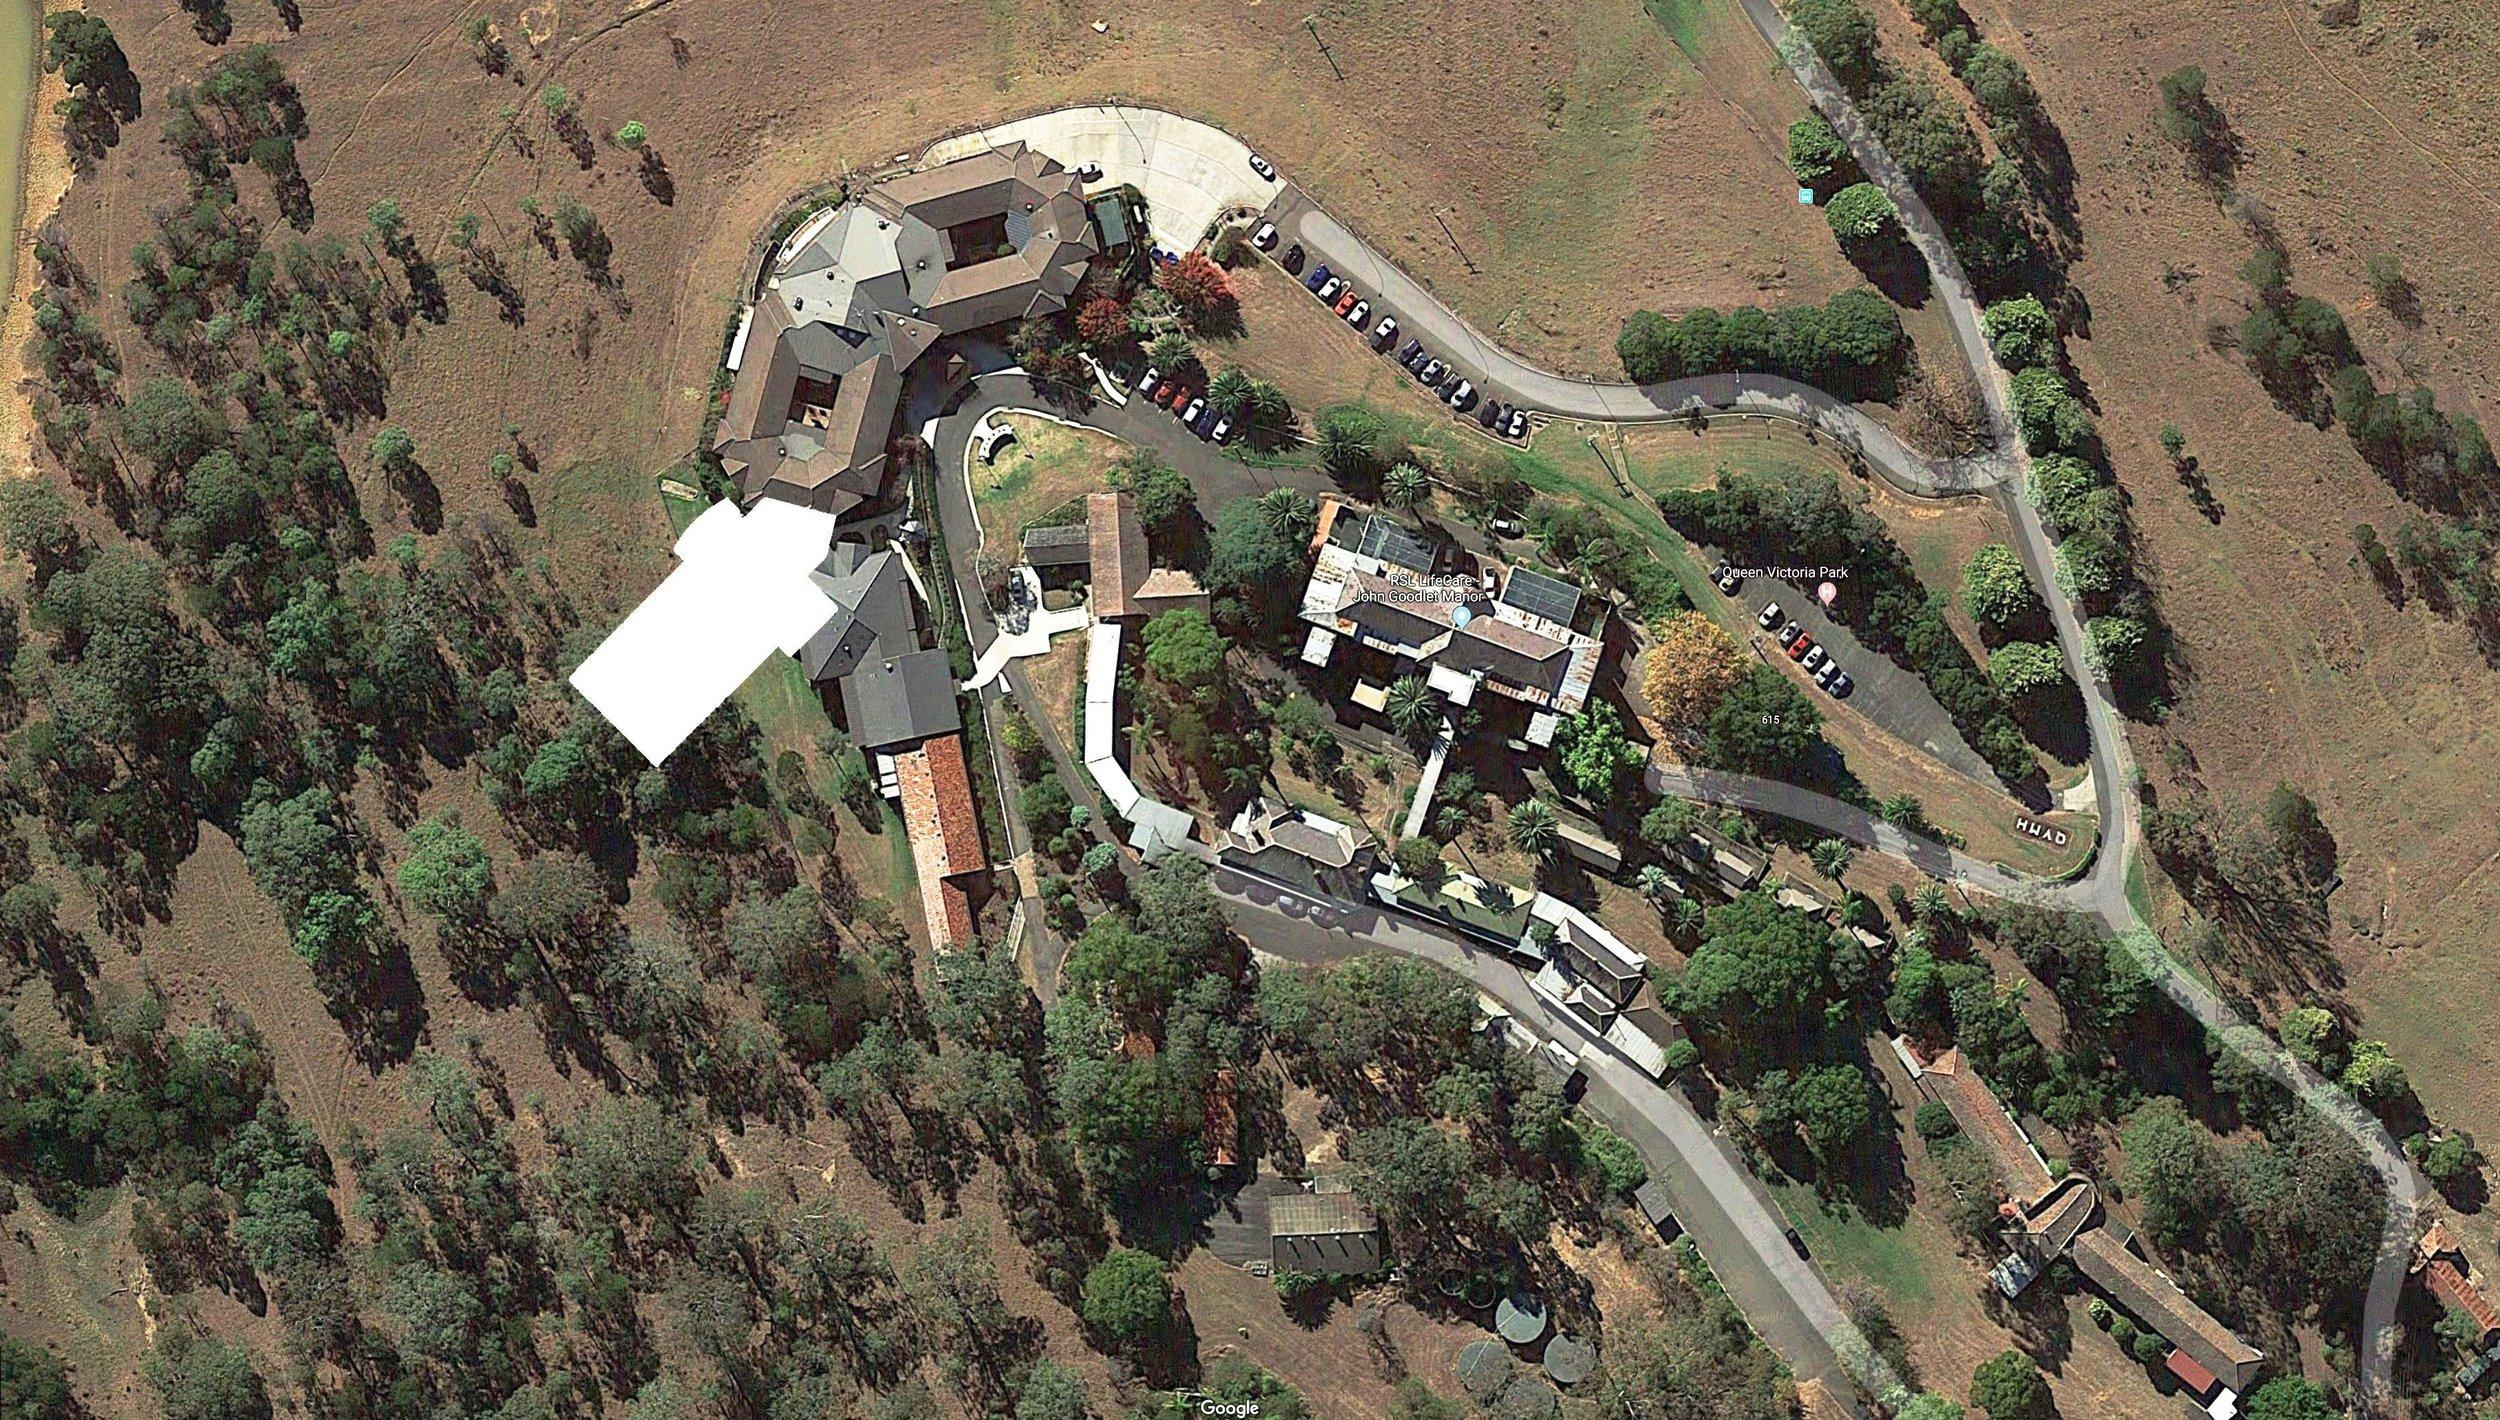 Queen Victoria Memorial Hospital Aerial3.jpg